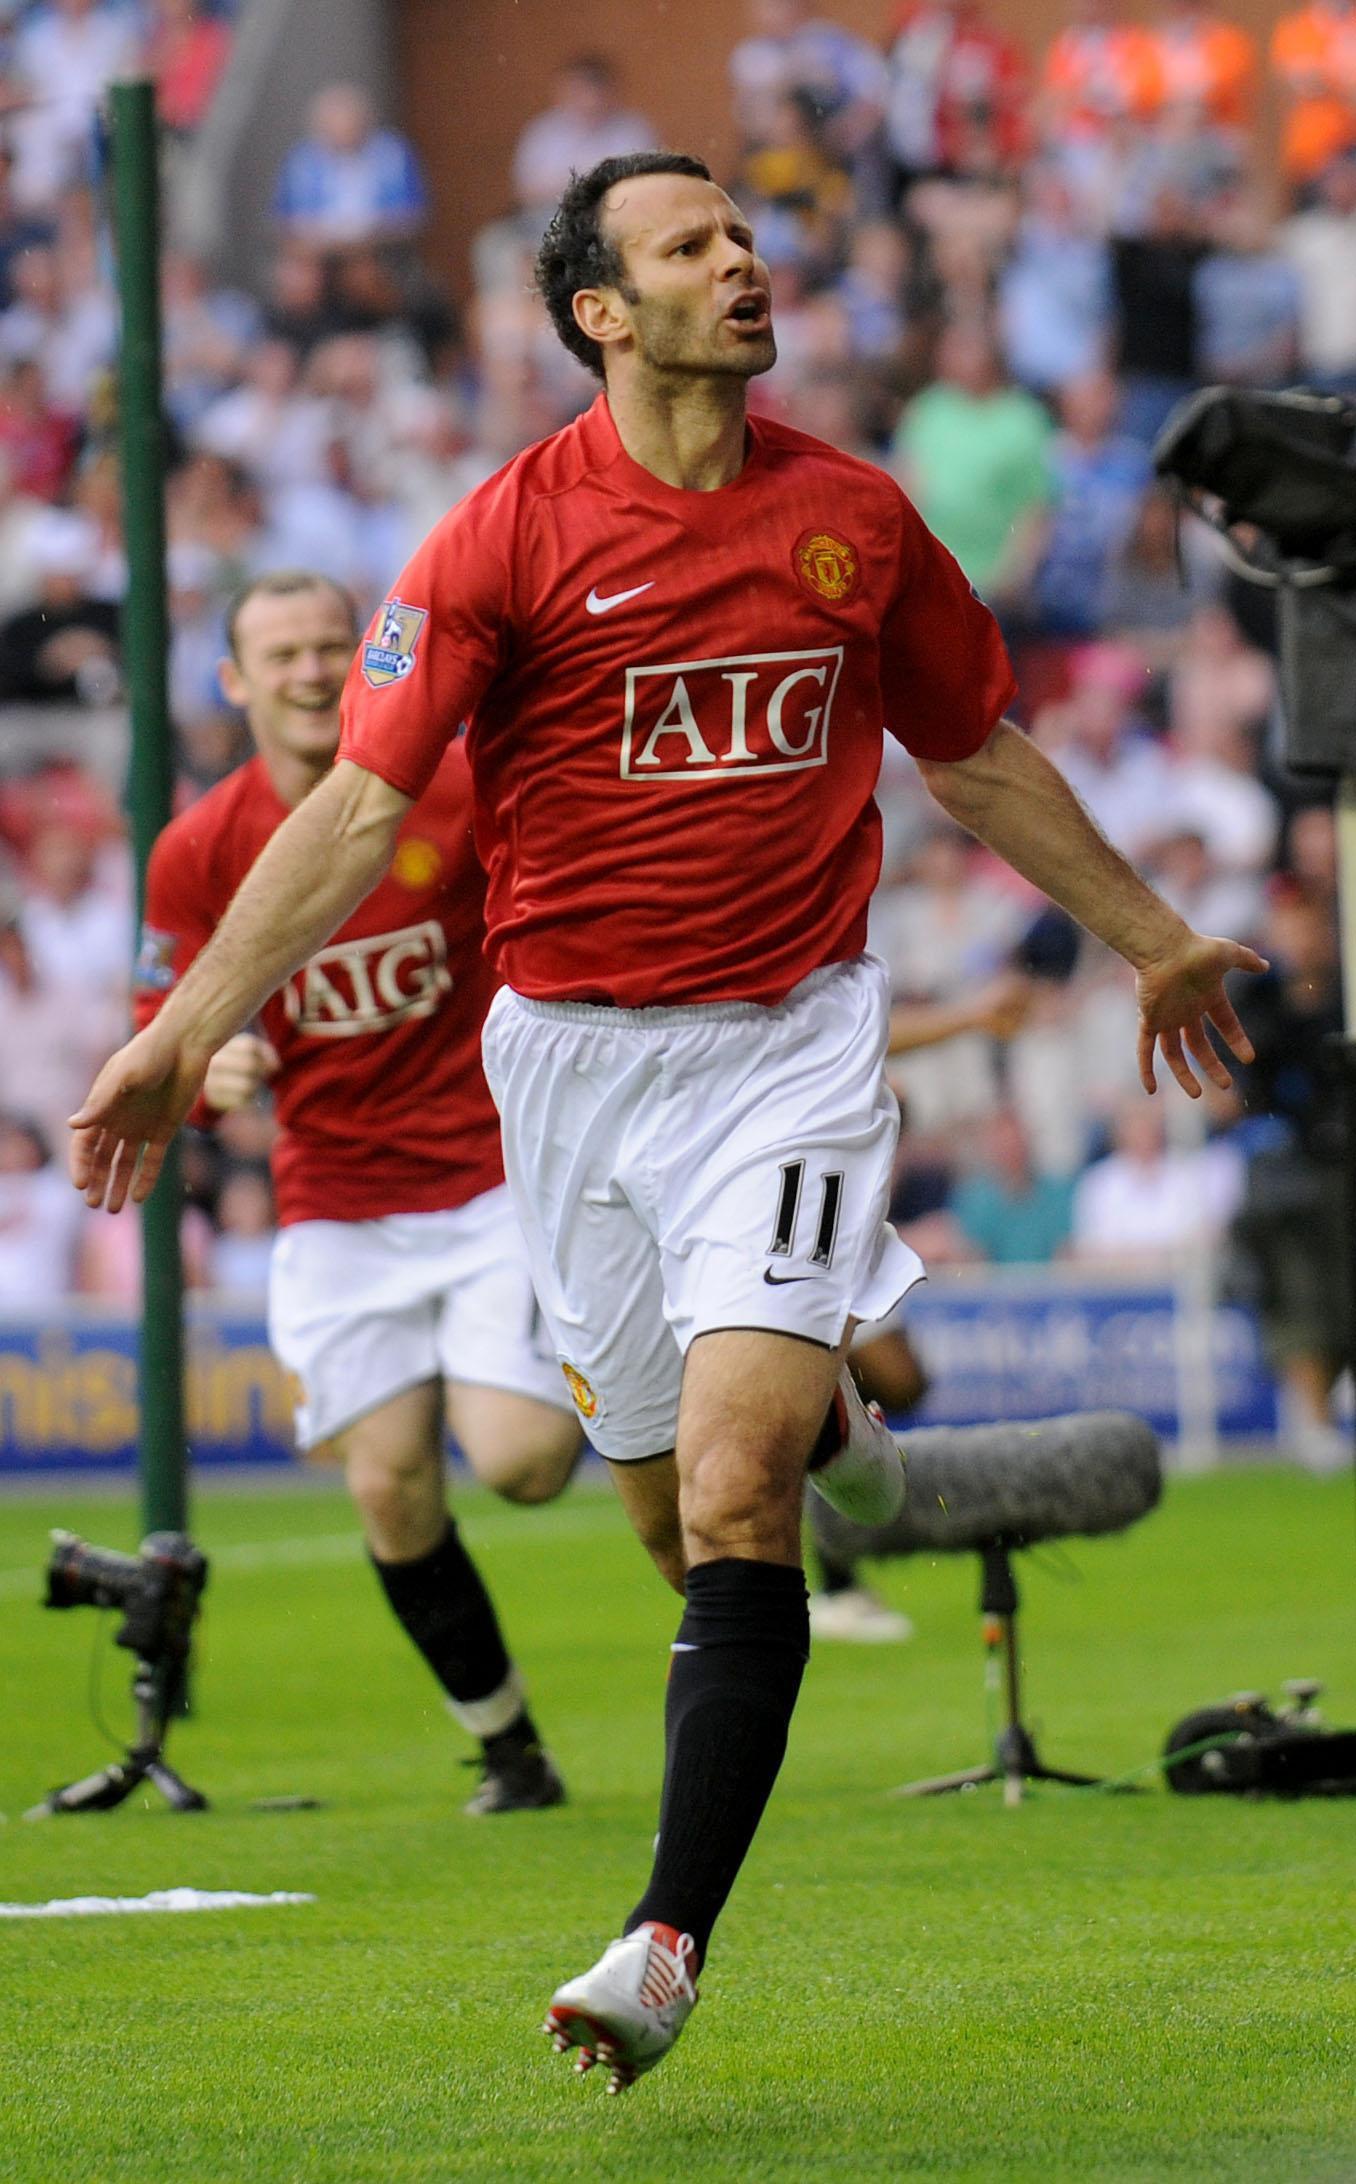 Soccer – Barclays Premier League – Wigan Athletic v Manchester United – JJB Stadium